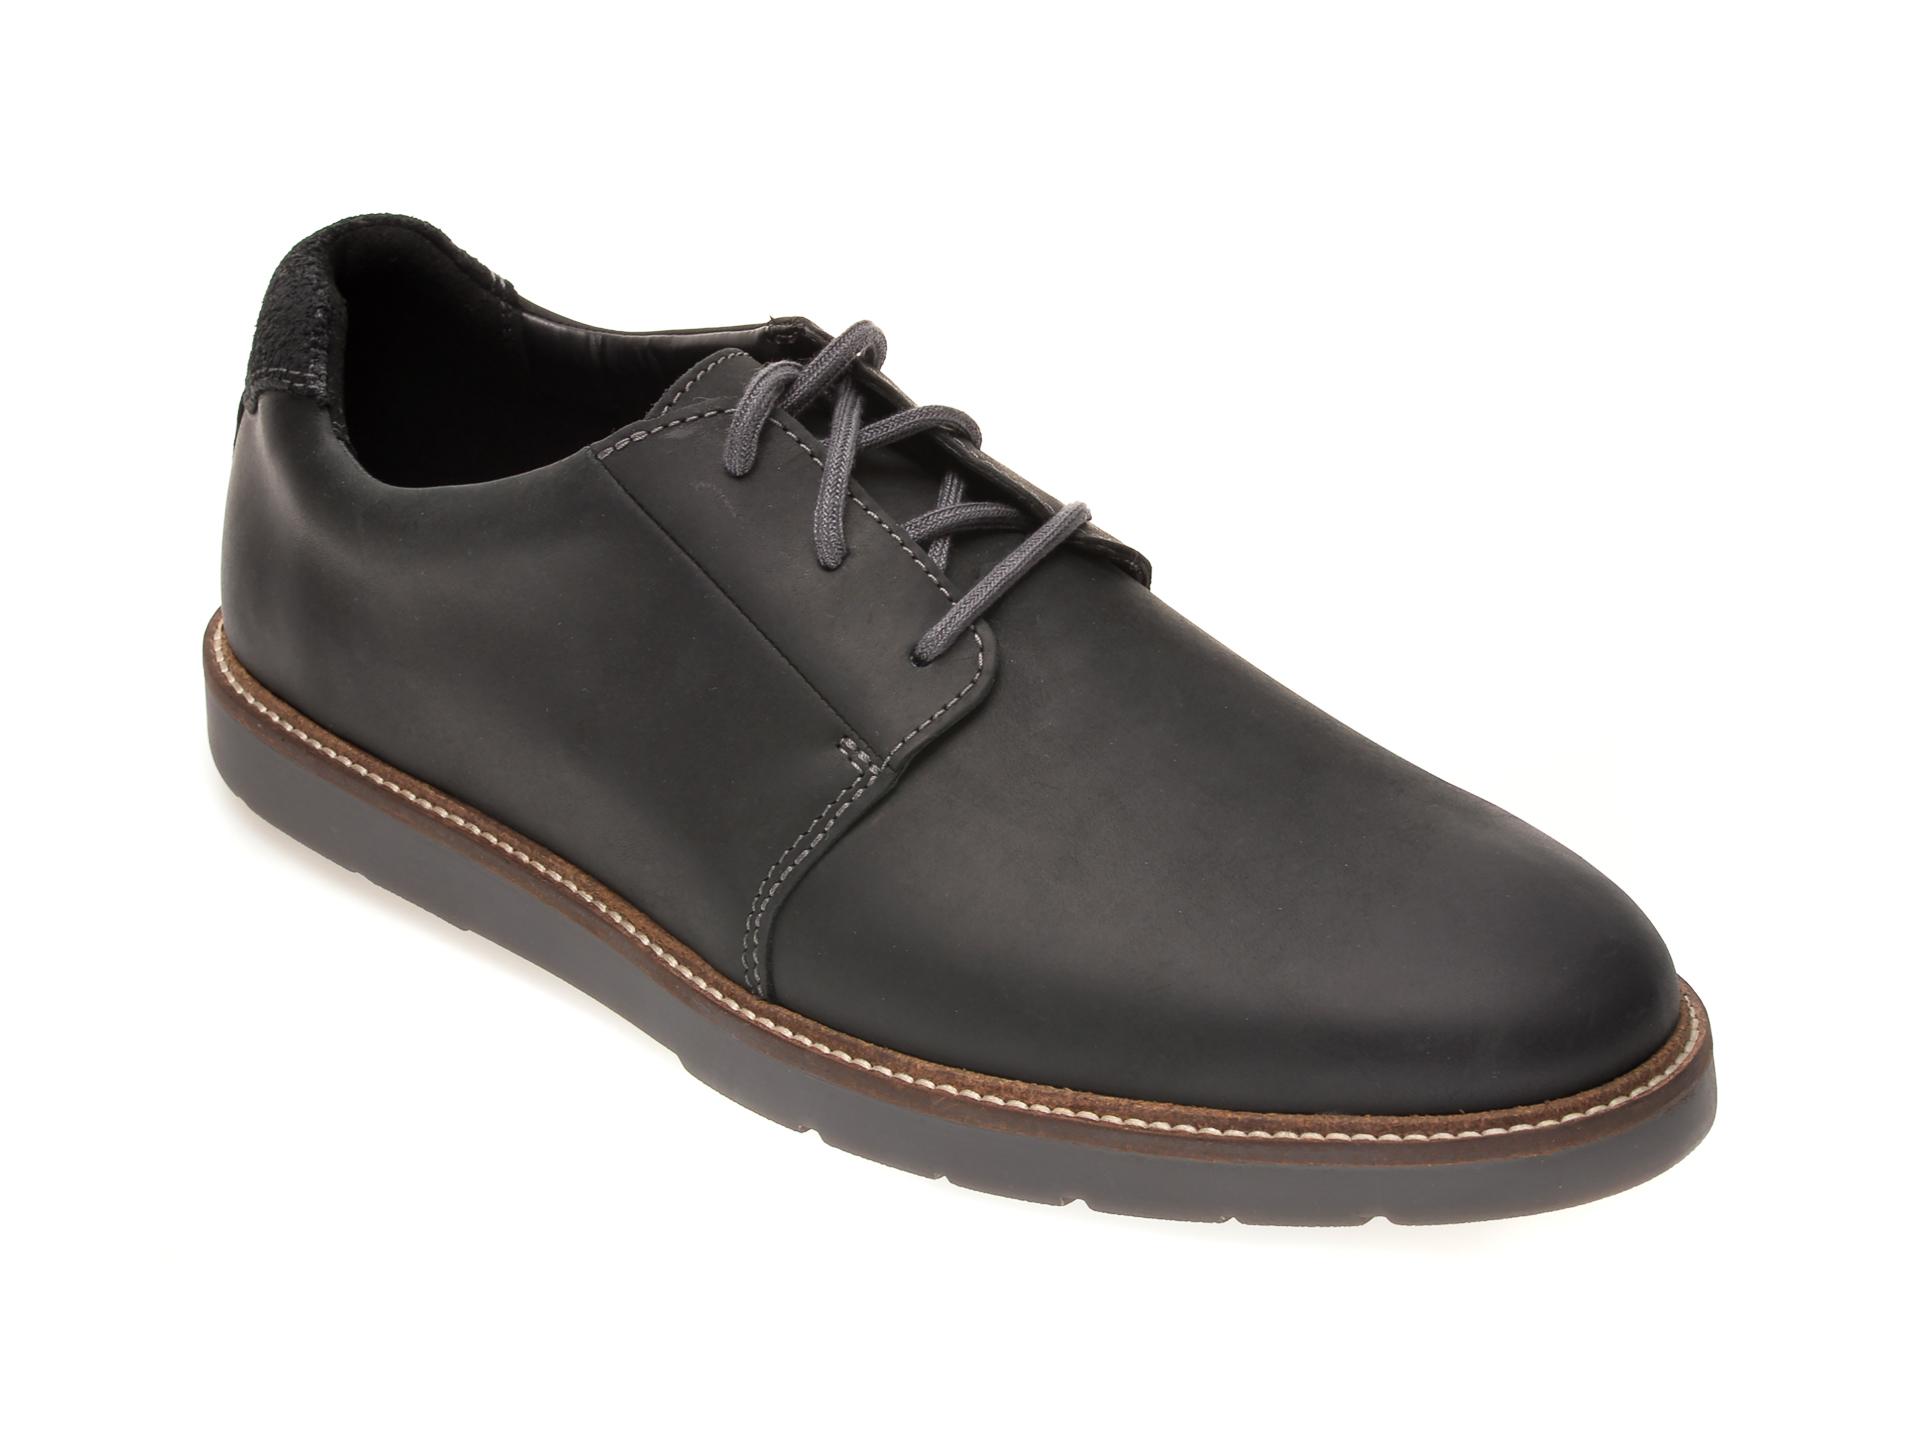 Pantofi CLARKS negri, GRANDIN PLAIN, din piele naturala imagine otter.ro